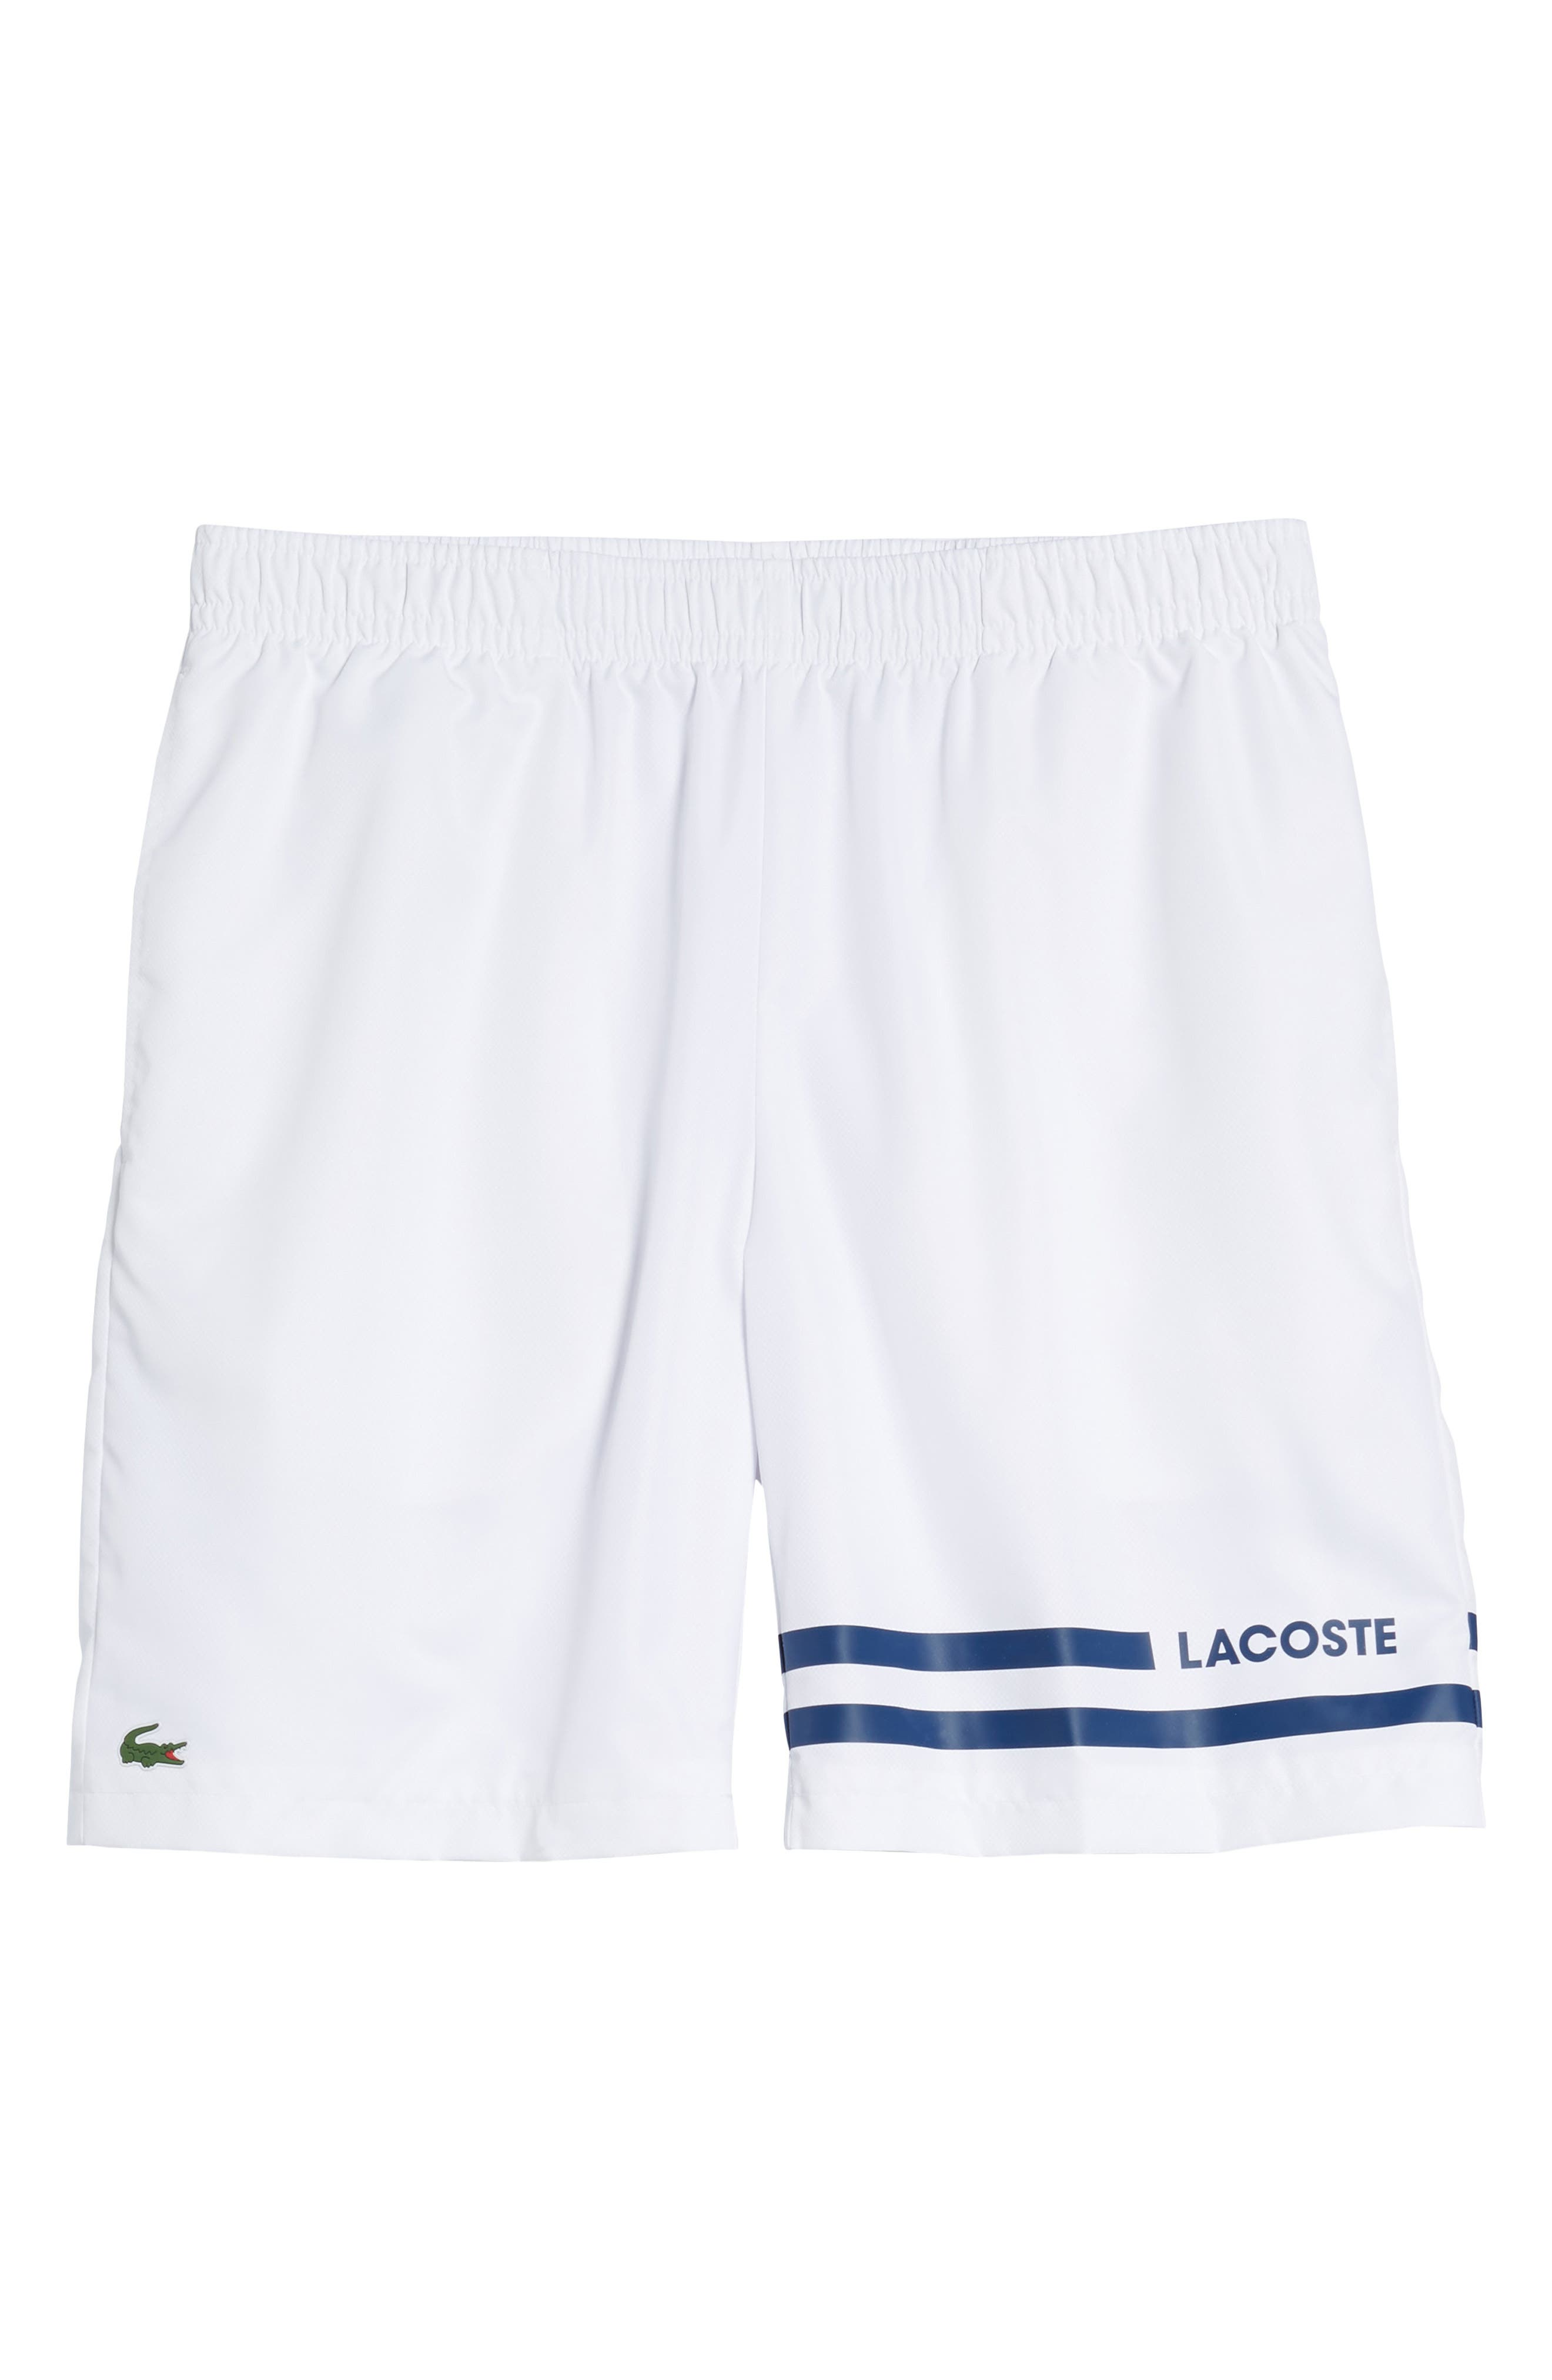 Stripe Shorts,                             Alternate thumbnail 6, color,                             WHITE/ MARINO